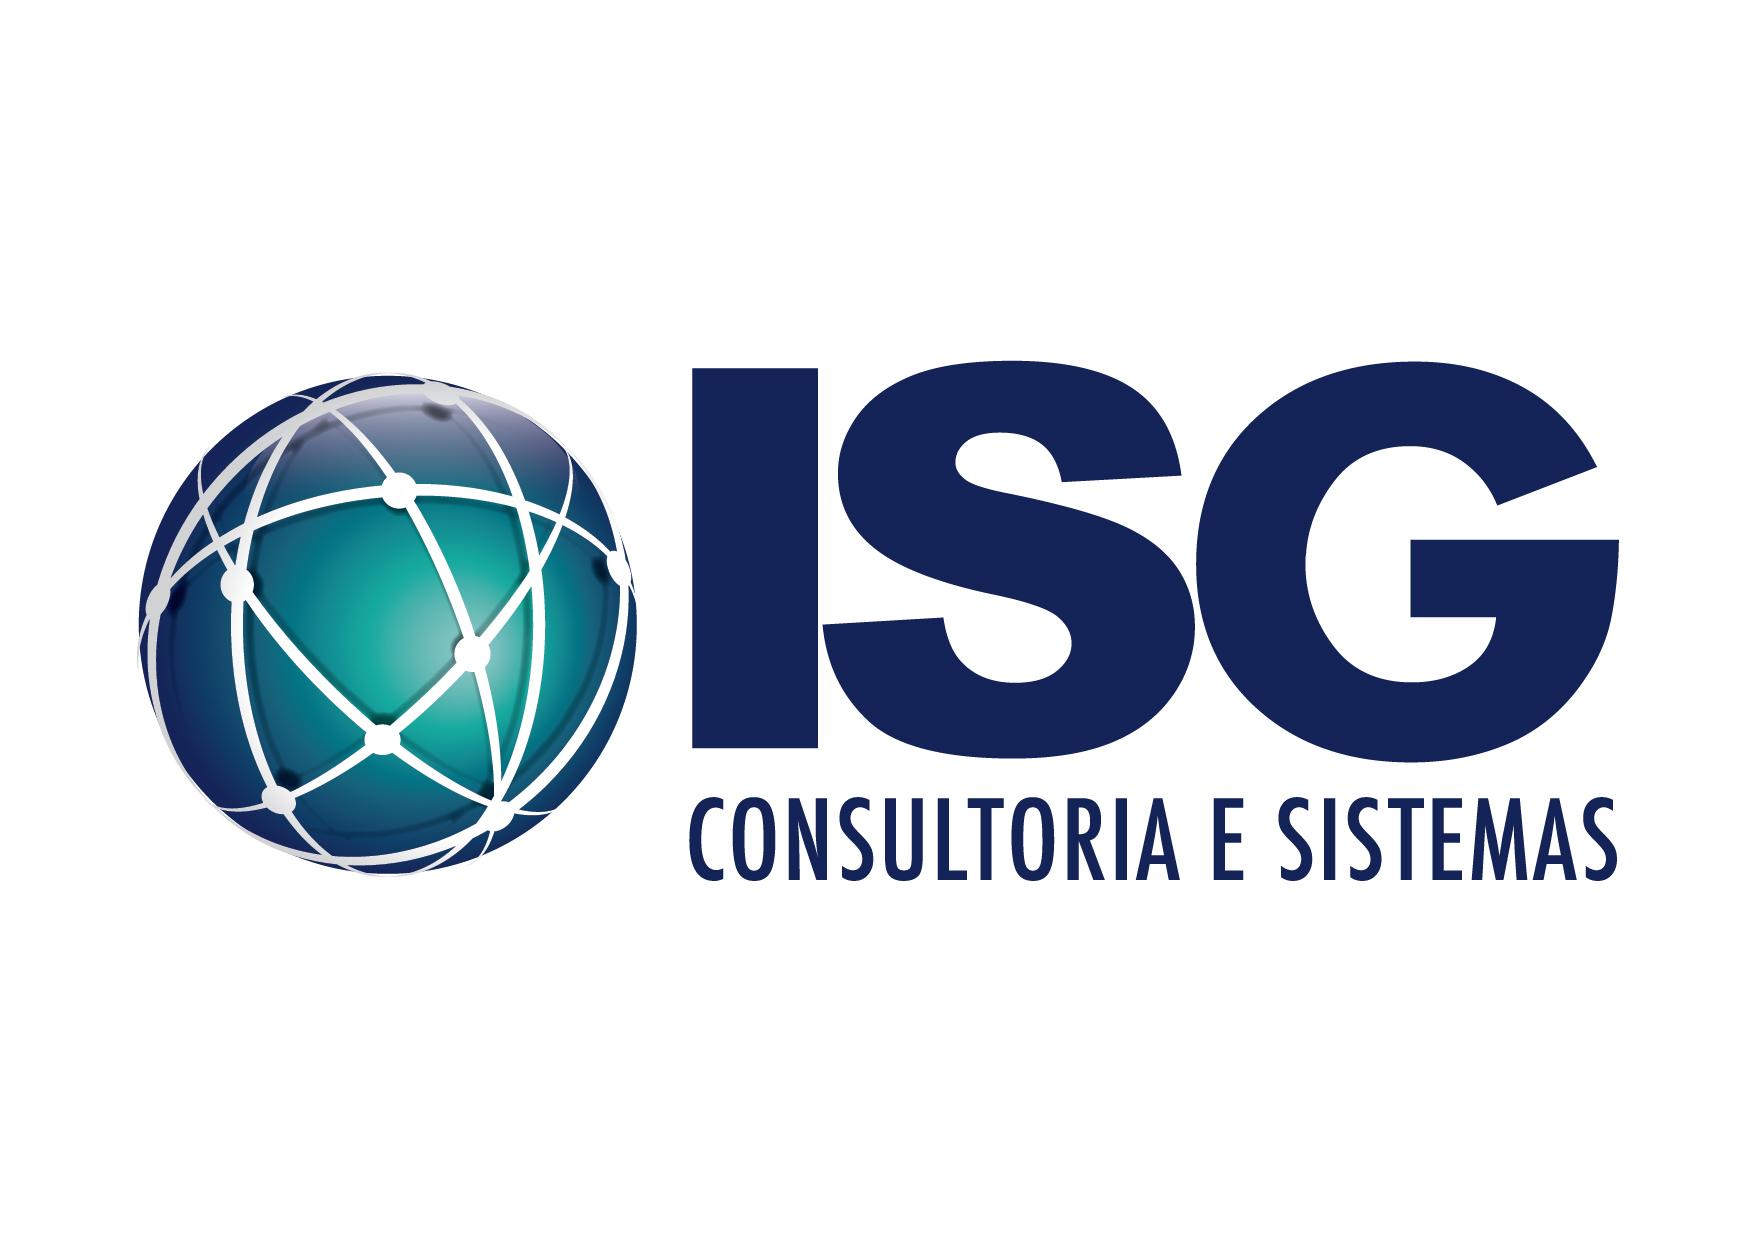 ISG Consultoria e Sistemas